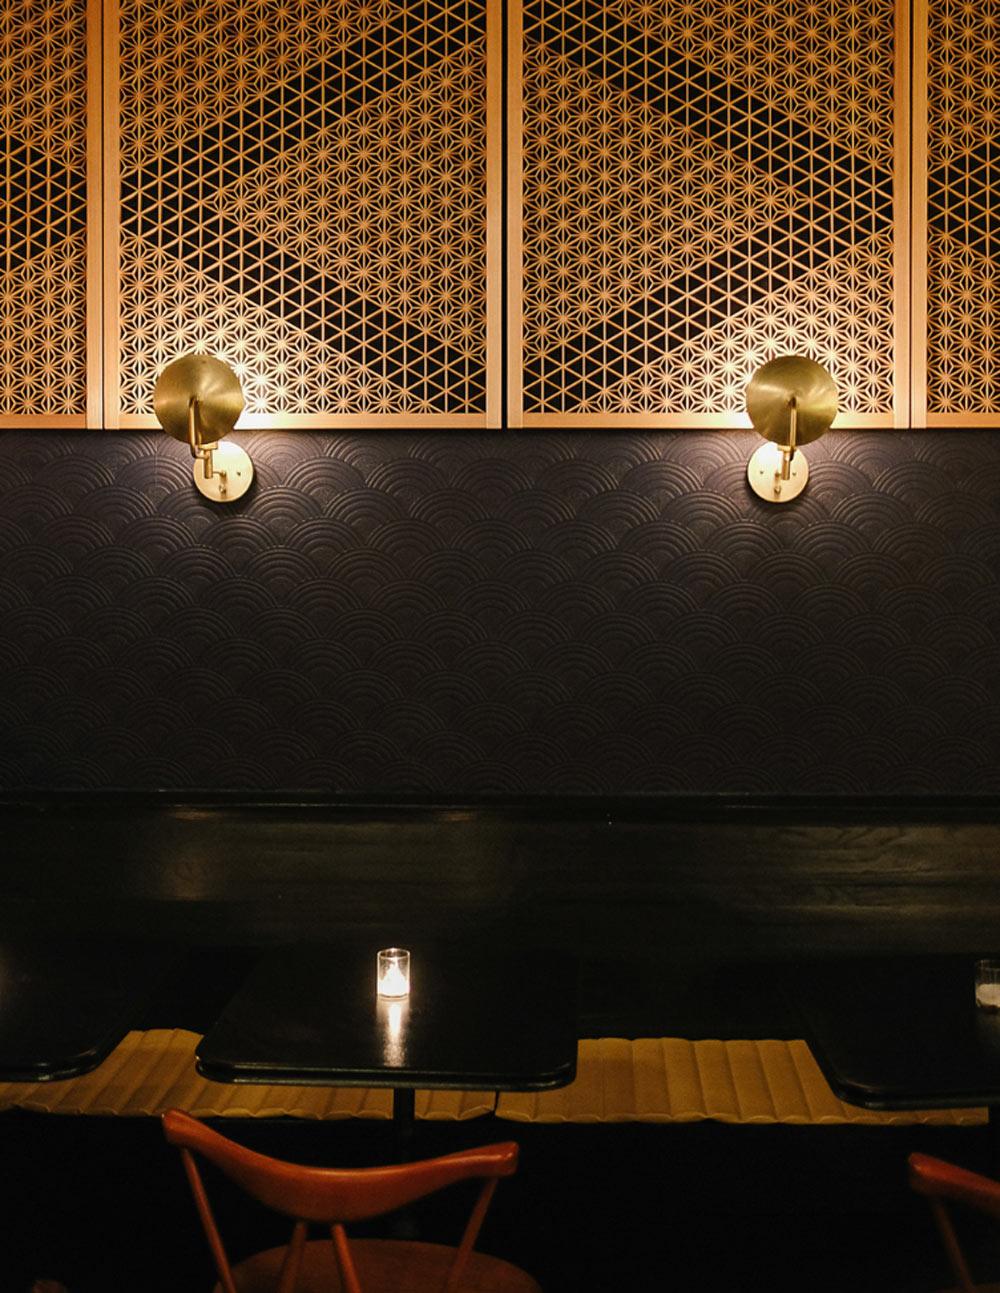 Karasu Restaurant by Space Exploration